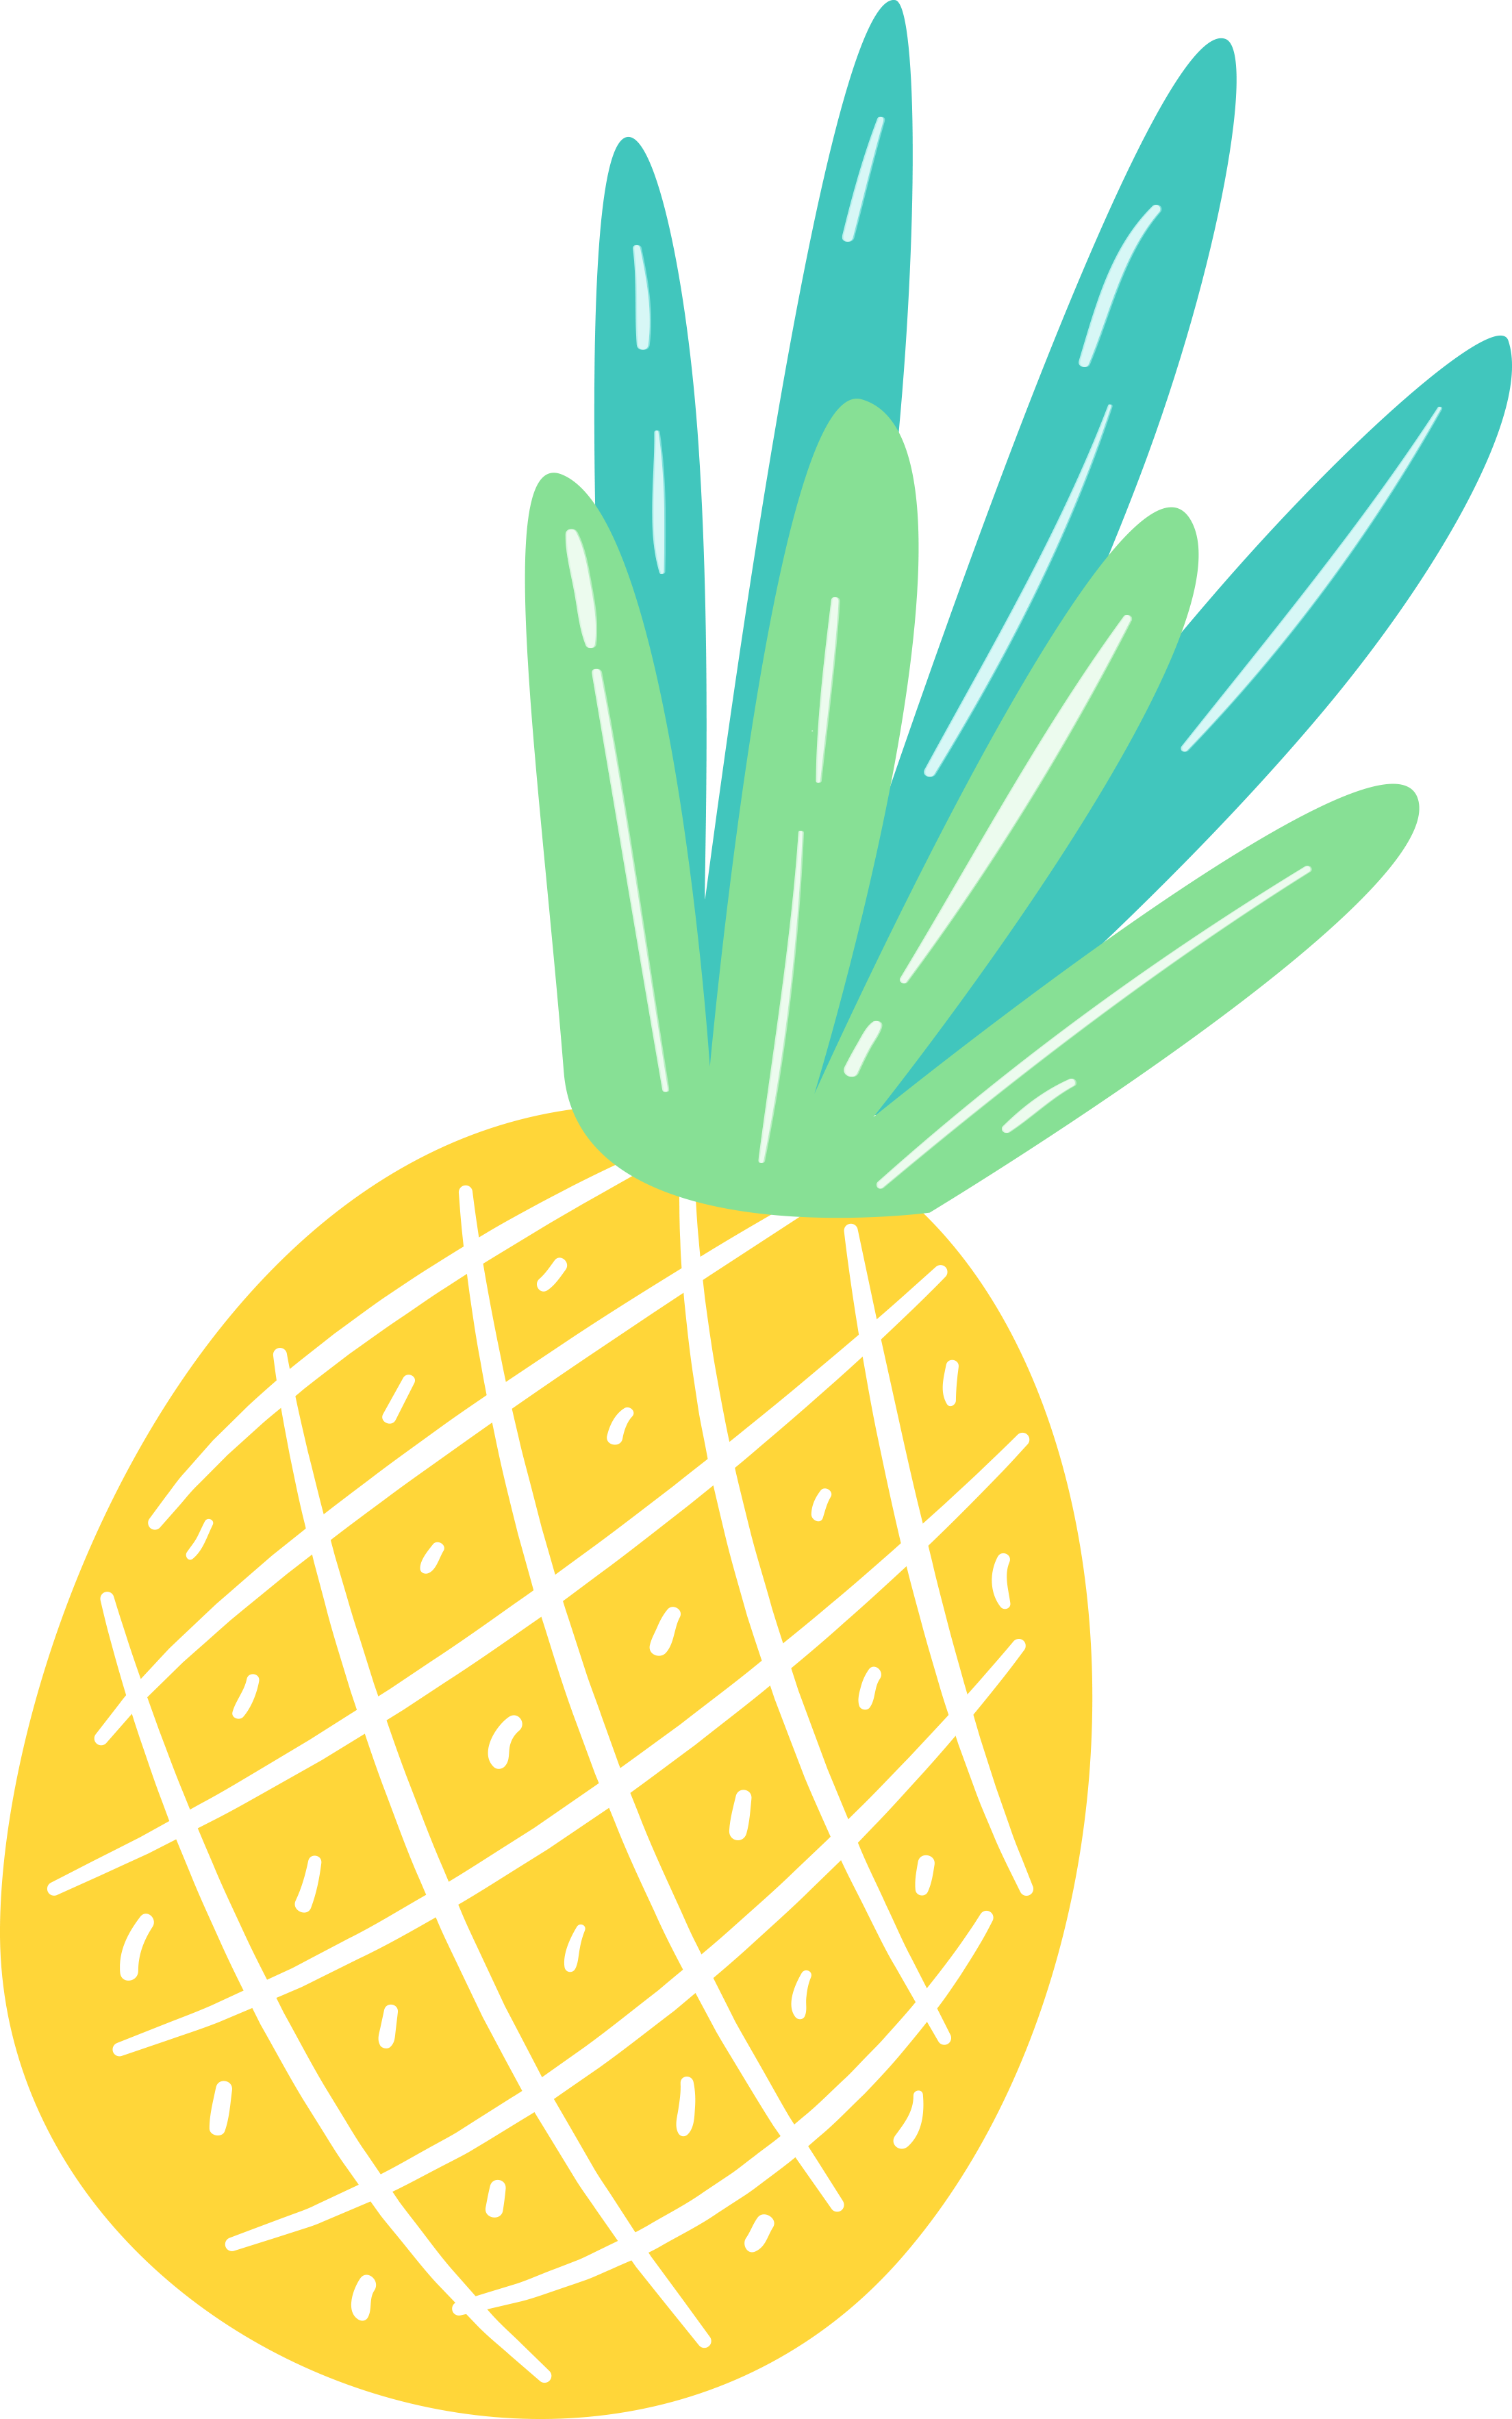 Pineapple clipart summer. Free fun pretty things